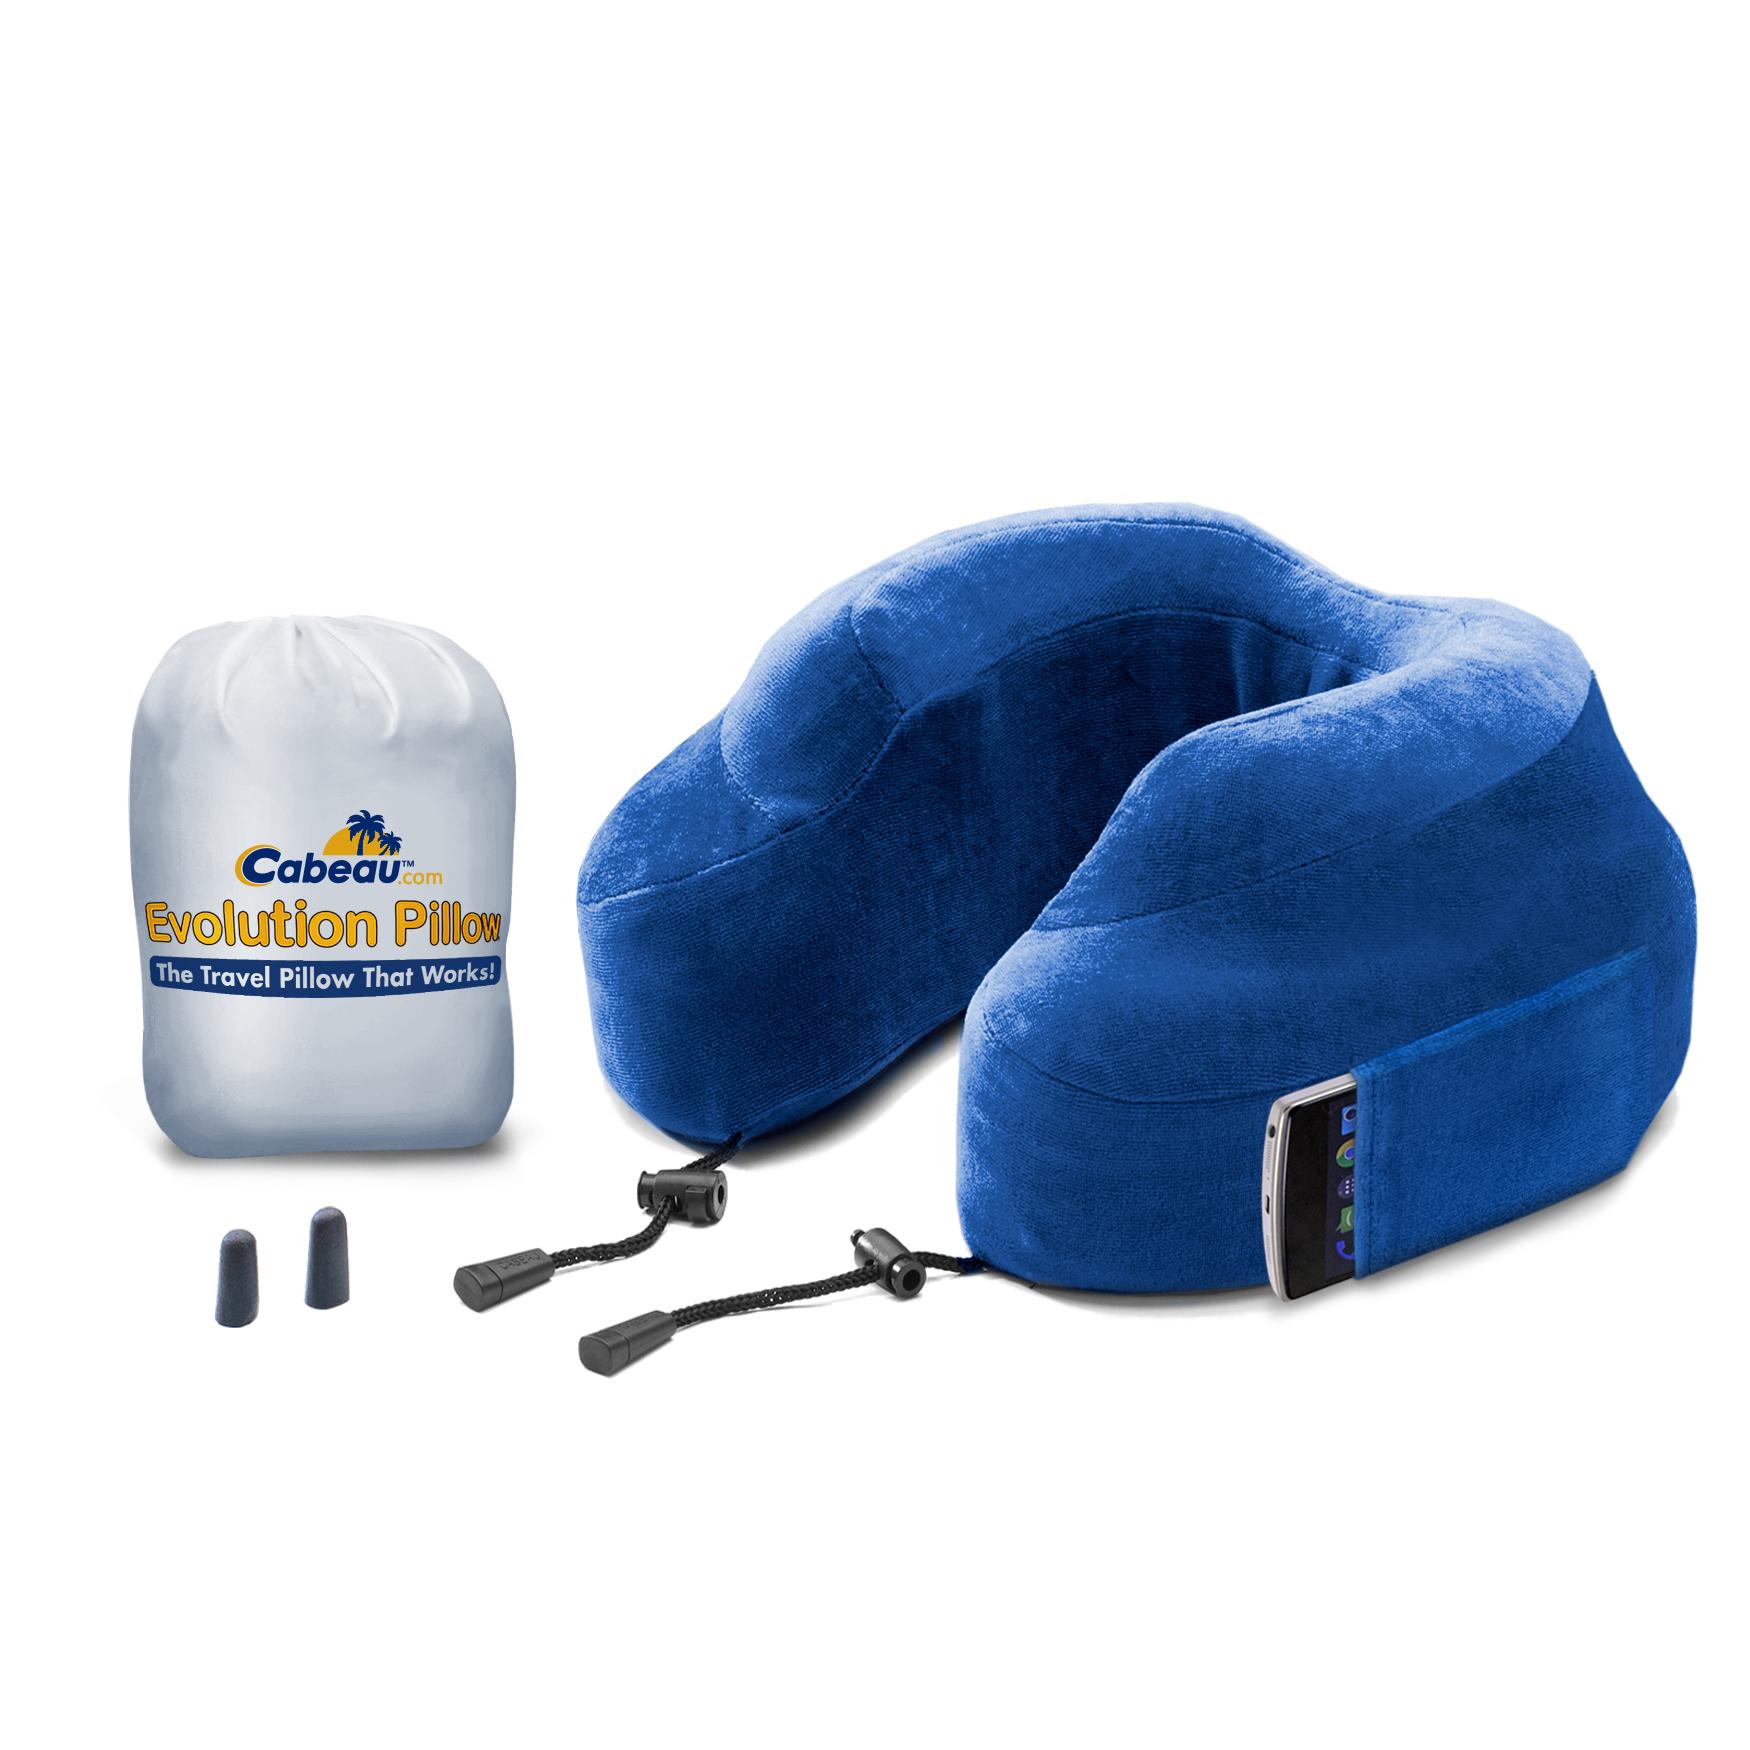 The Cabeau Memory Foam Evolution neck pillow.